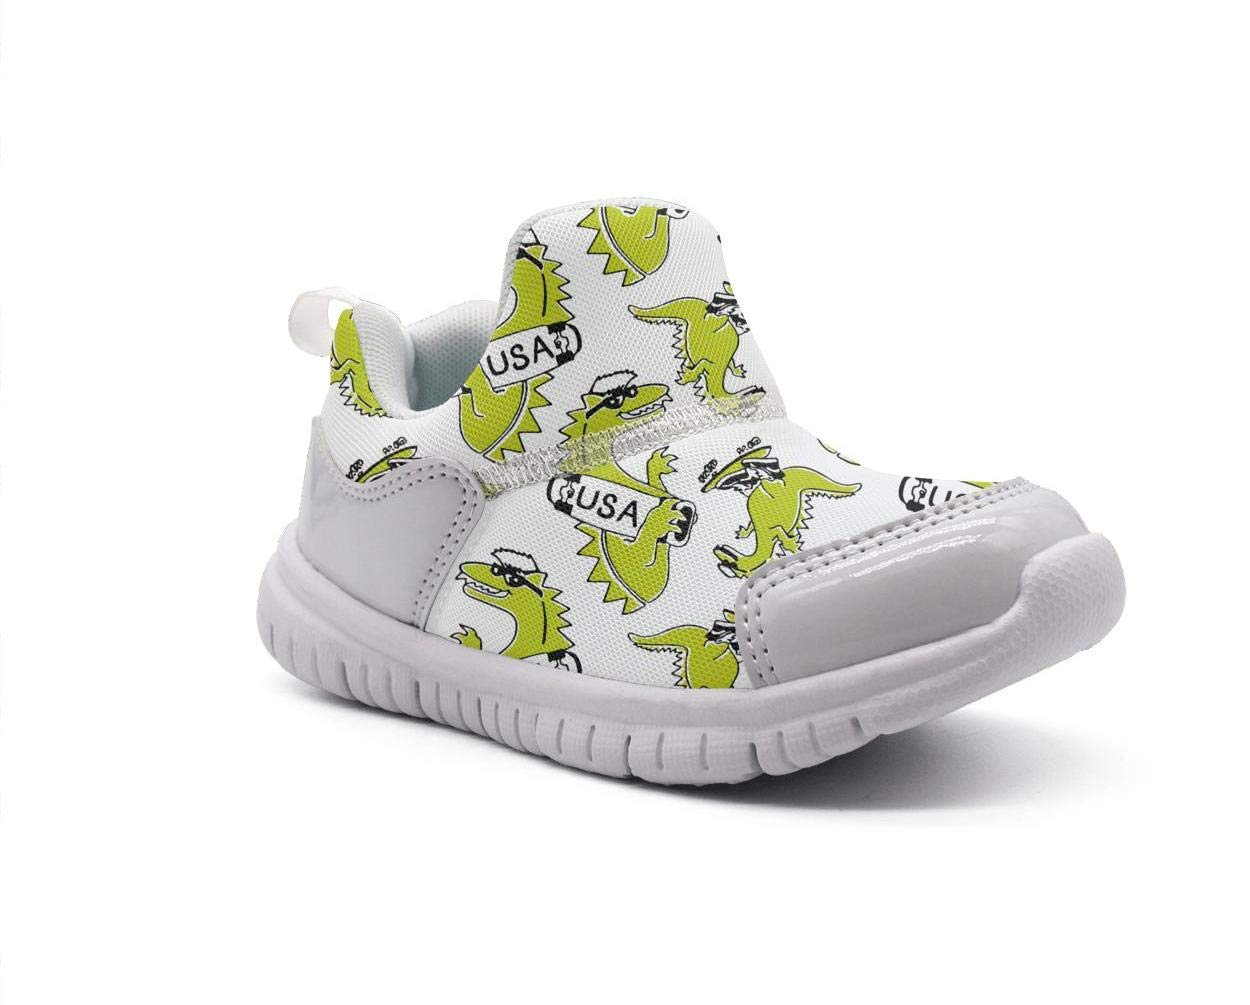 ONEYUAN Children Dinosaur New York van/ï/¼osaur USA White Kid Casual Lightweight Sport Shoes Sneakers Walking Athletic Shoes